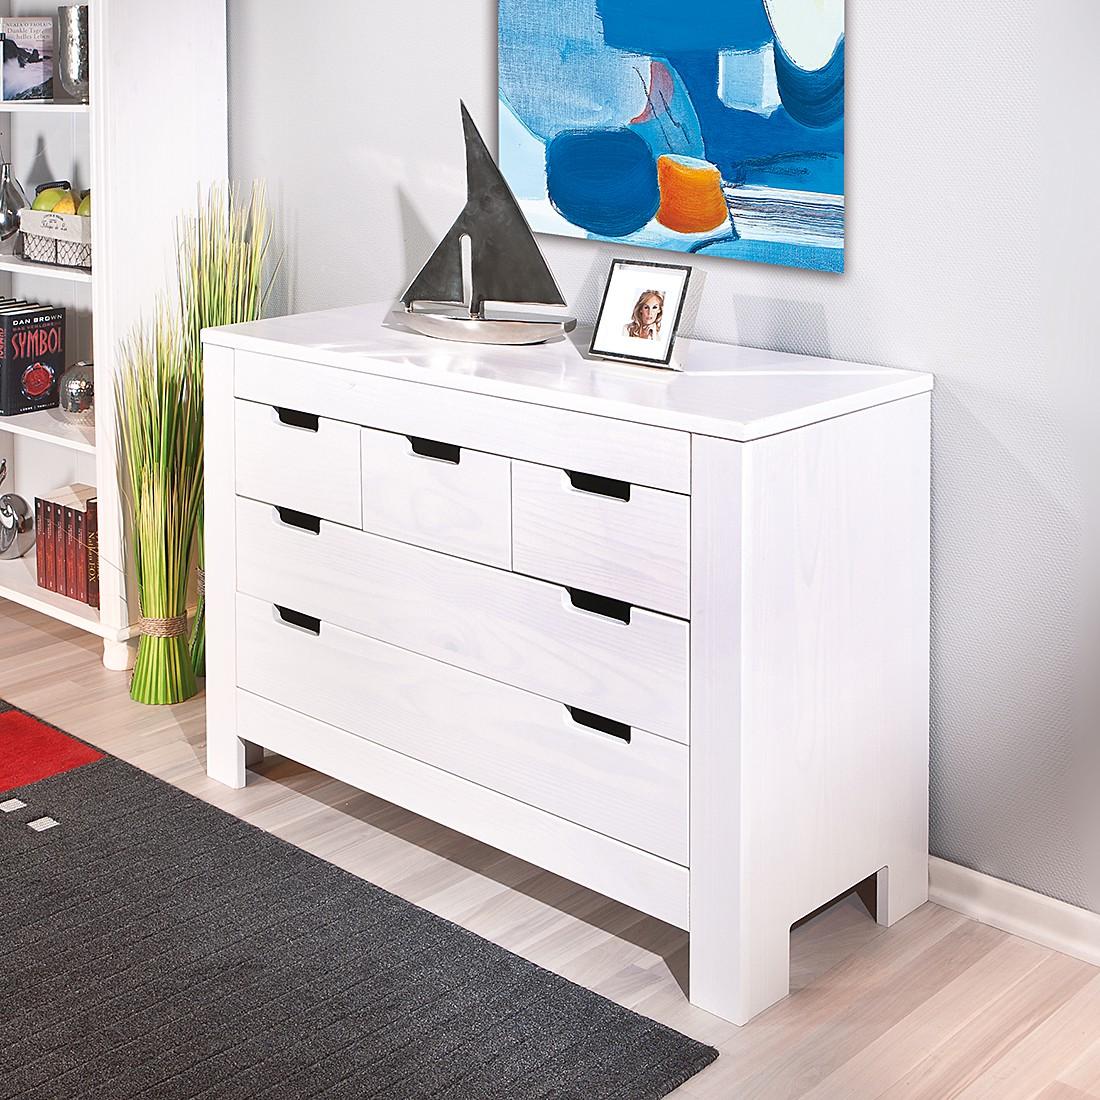 kommode kiefer wei lasiert finest full size of wei lovely schrank natur awesome genial kiefer. Black Bedroom Furniture Sets. Home Design Ideas